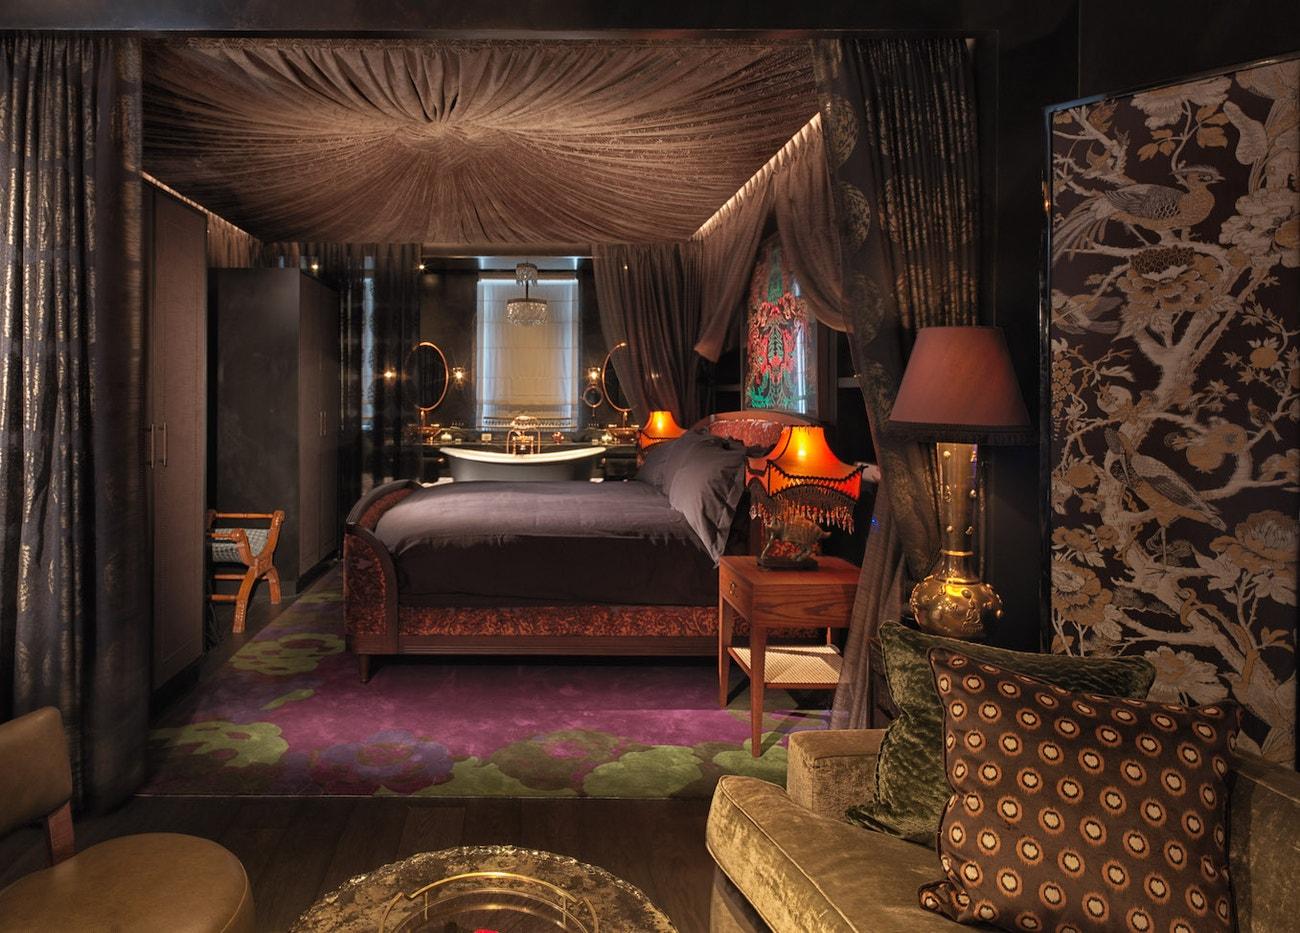 Mandrake Suite v hotelu The Mandrake